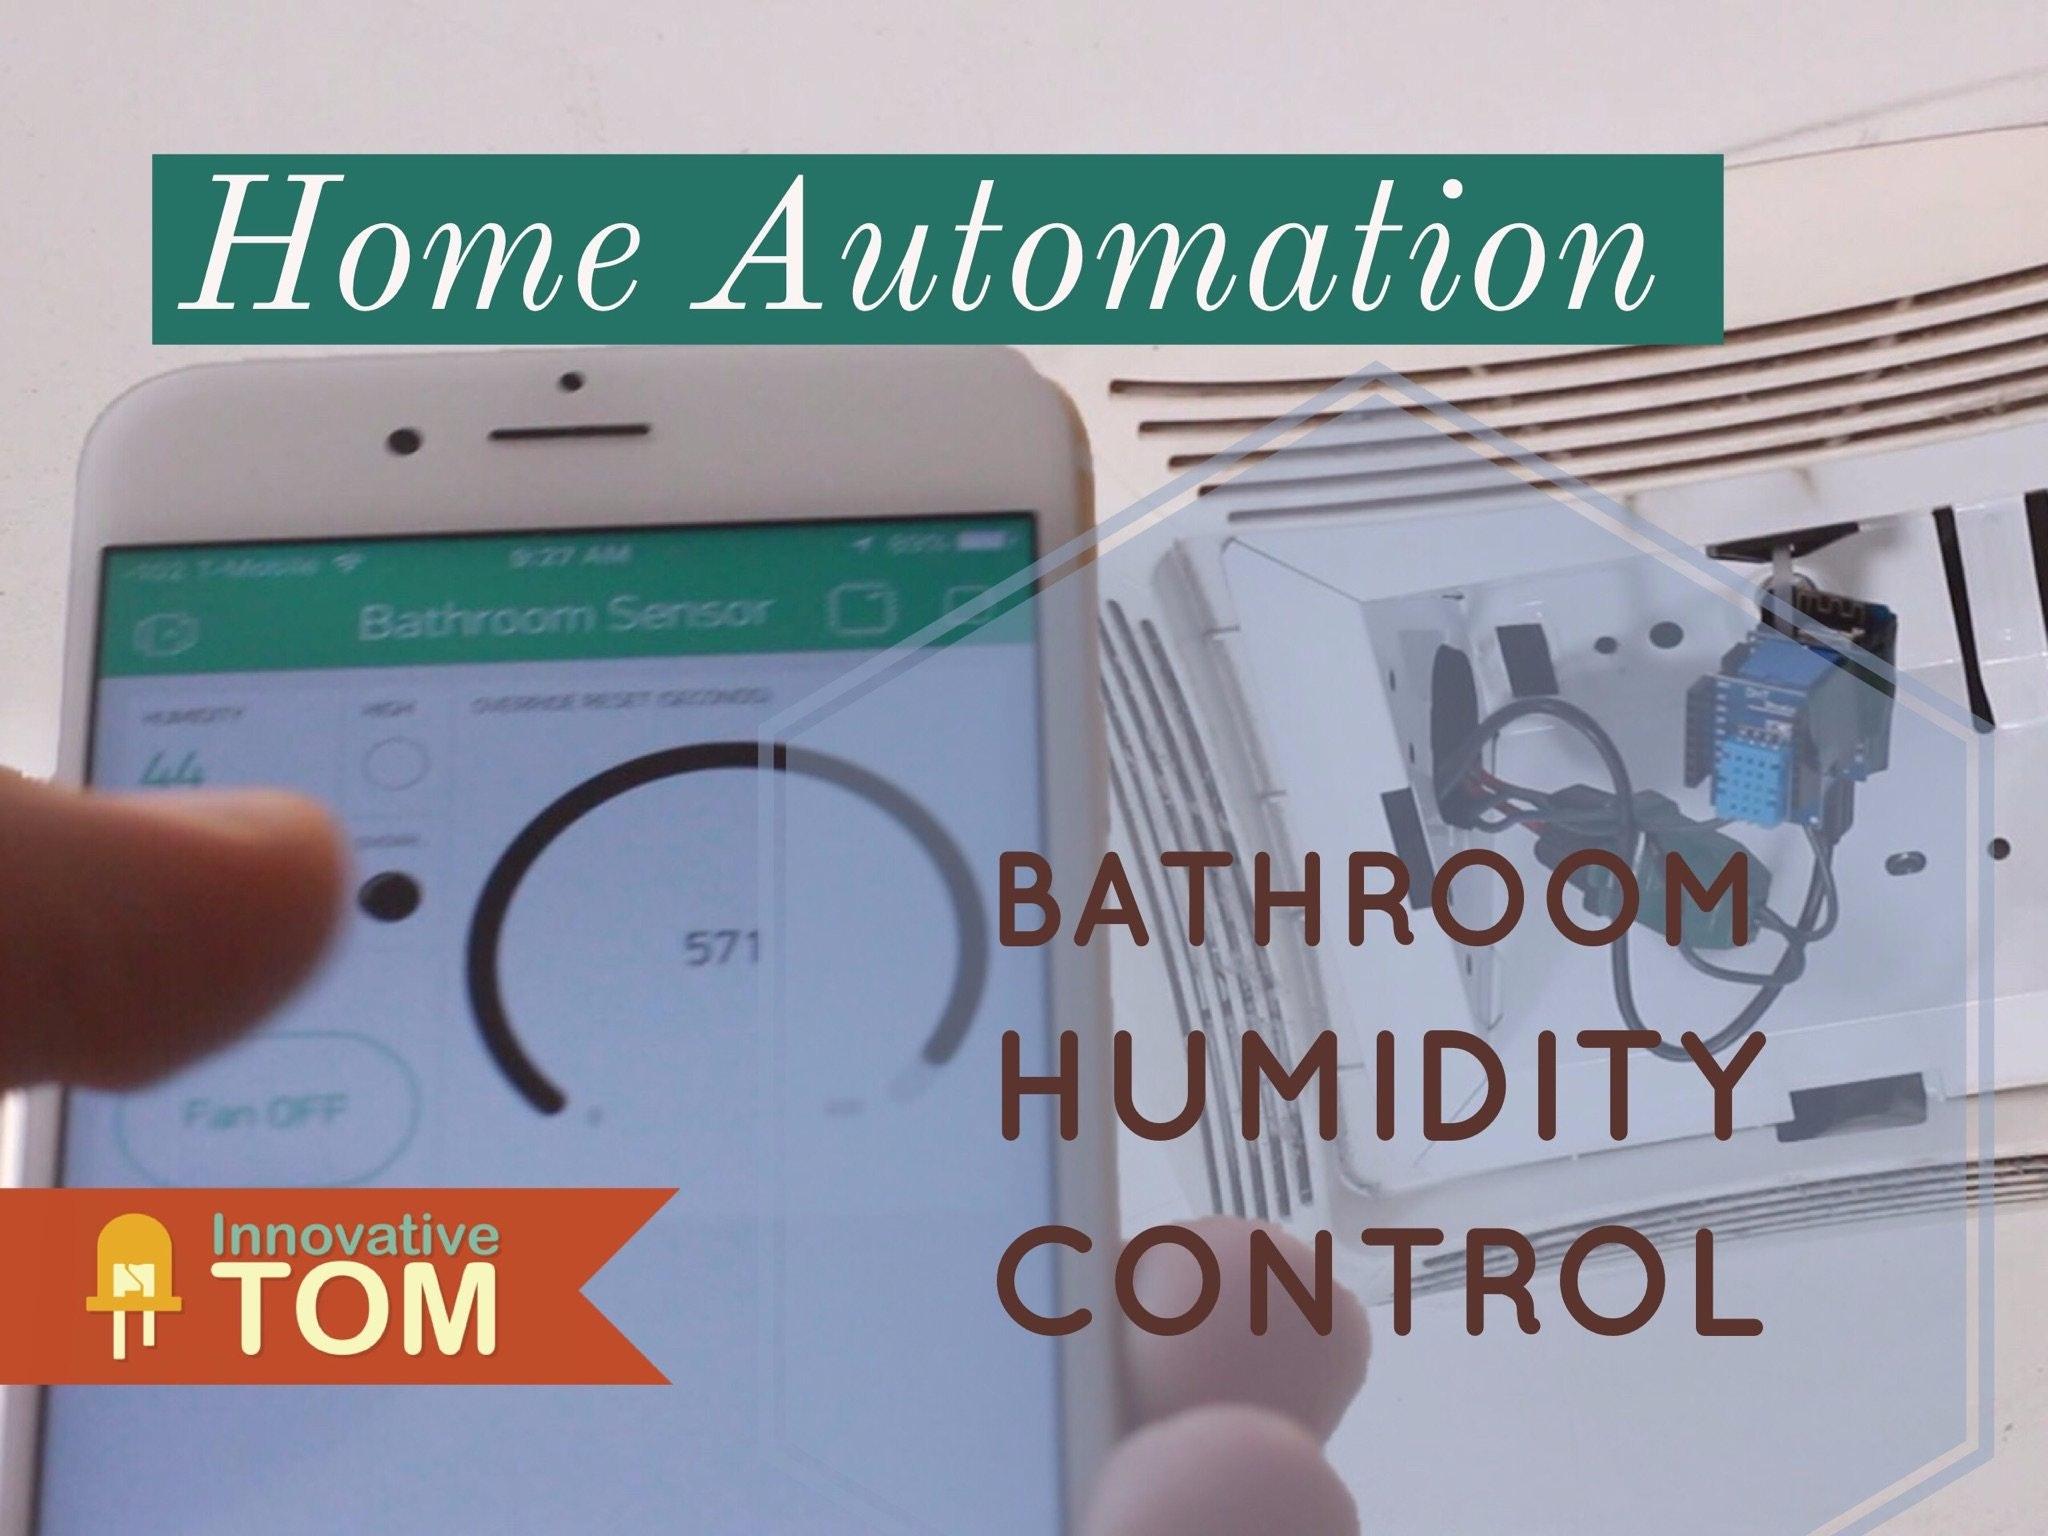 Exceptionnel WiFi Bathroom Humidity Sensor With Fan Control